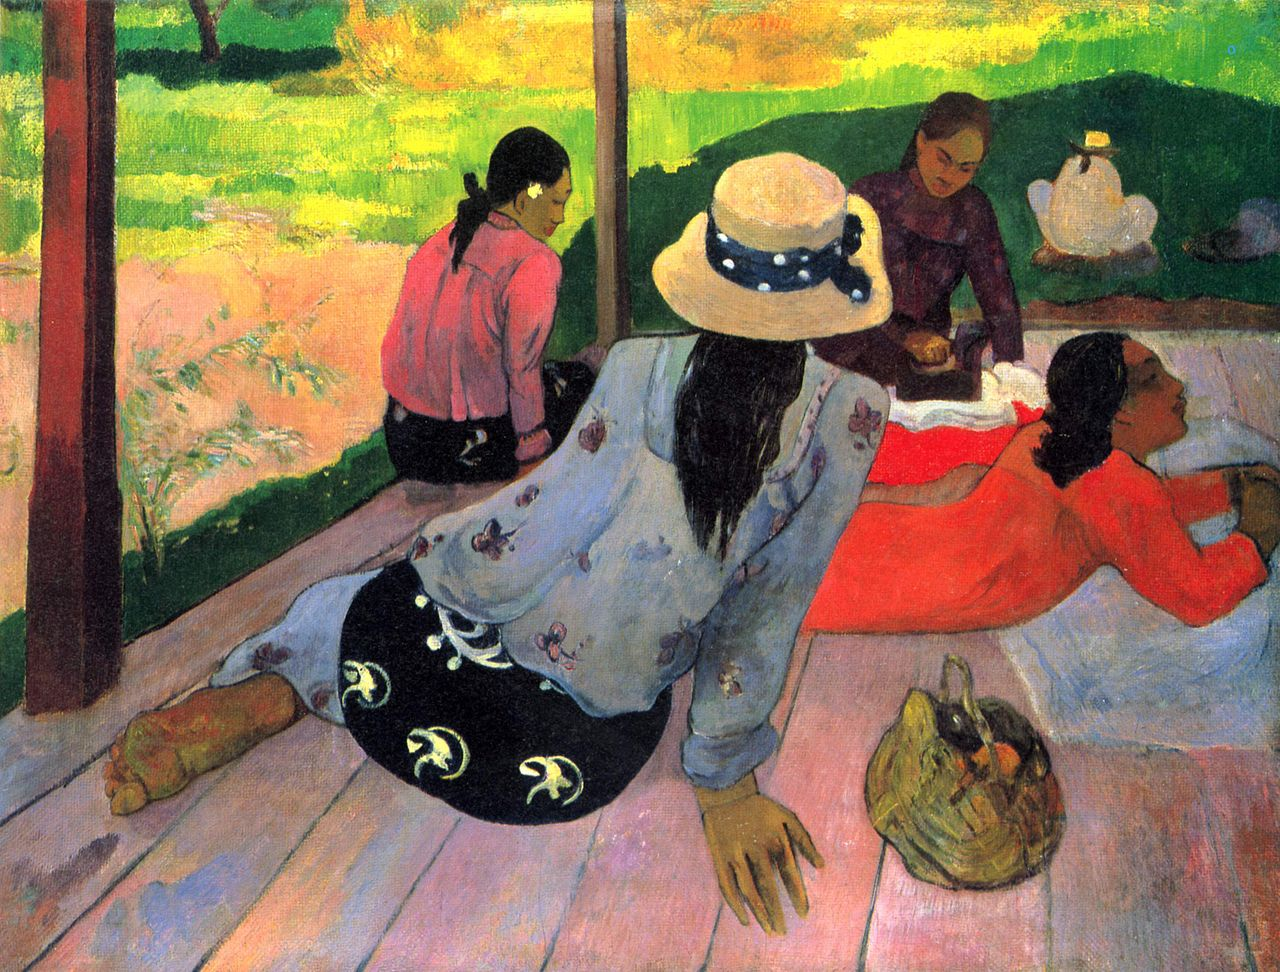 印象派怪客高更(Paul Gauguin)作品「午憩」(Midday Nap)1892-94